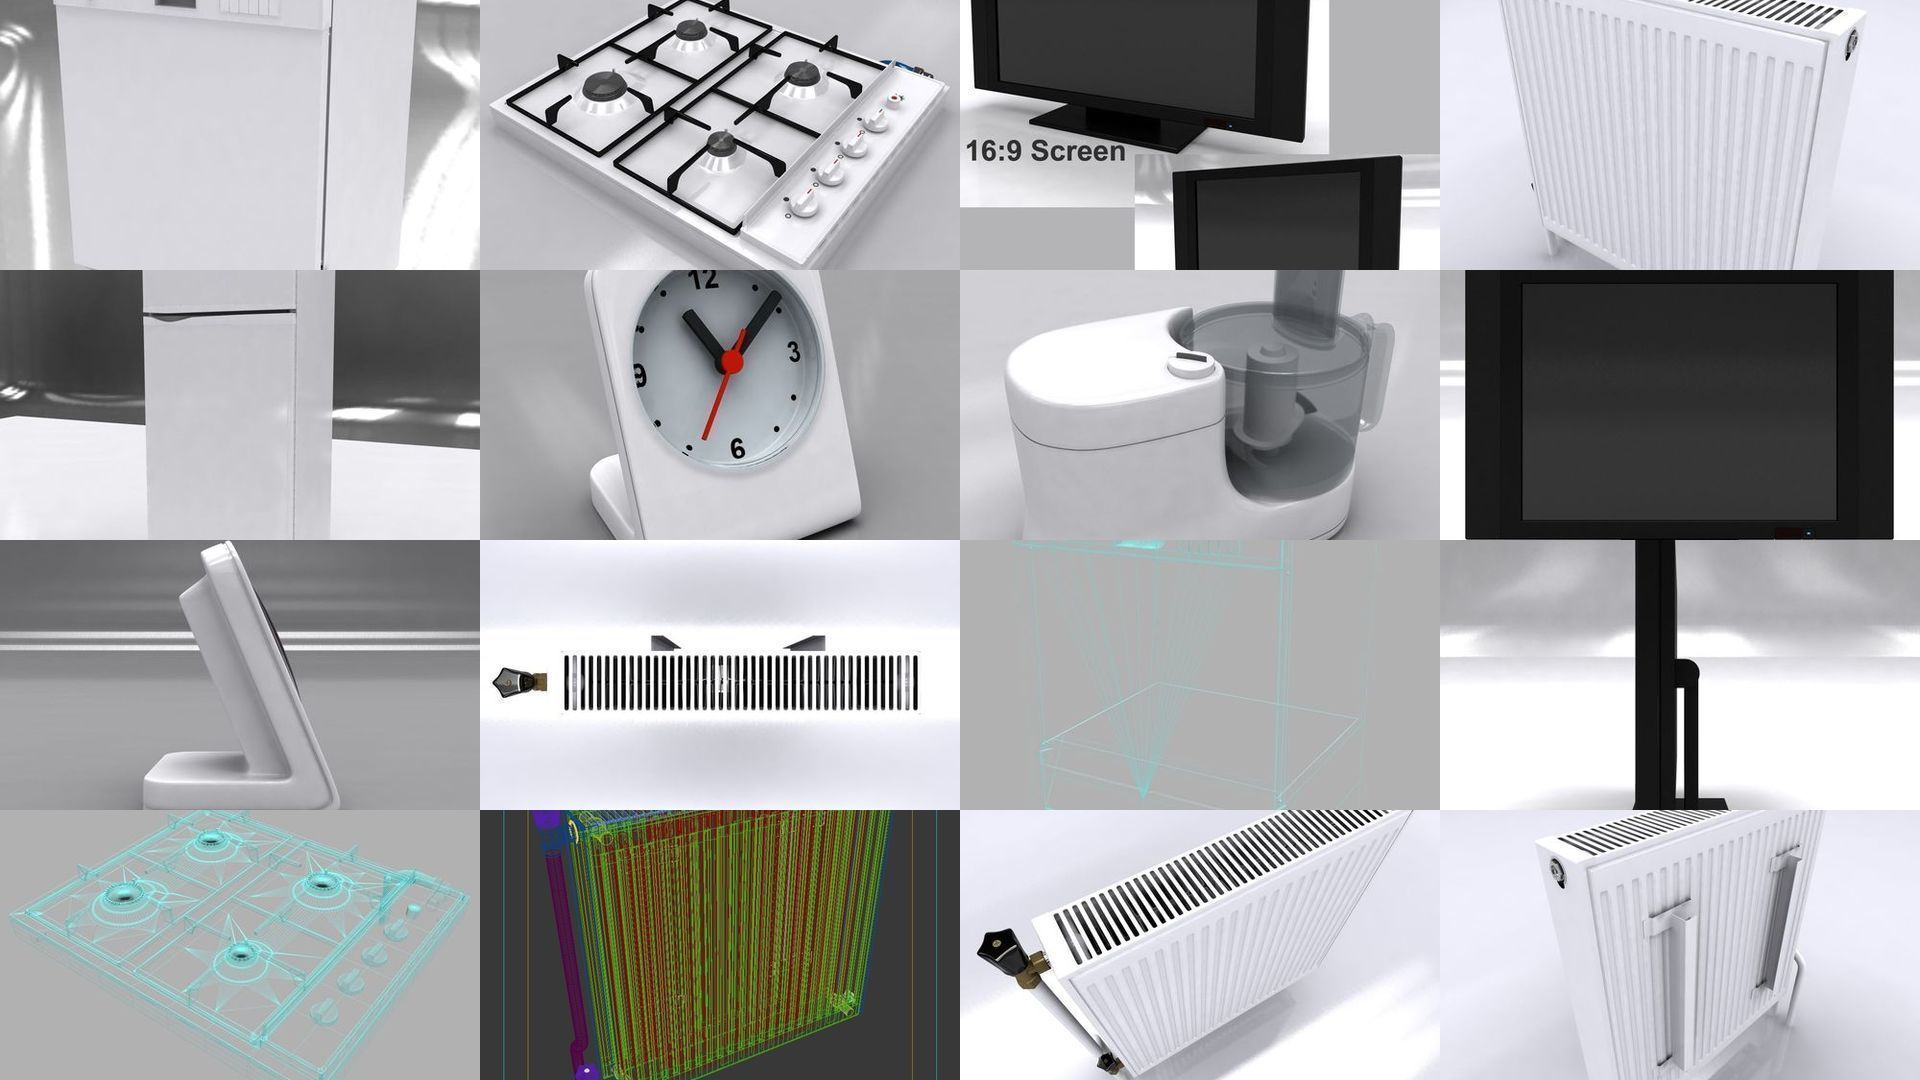 Kitchen Household Appliances | 3D Model Collection